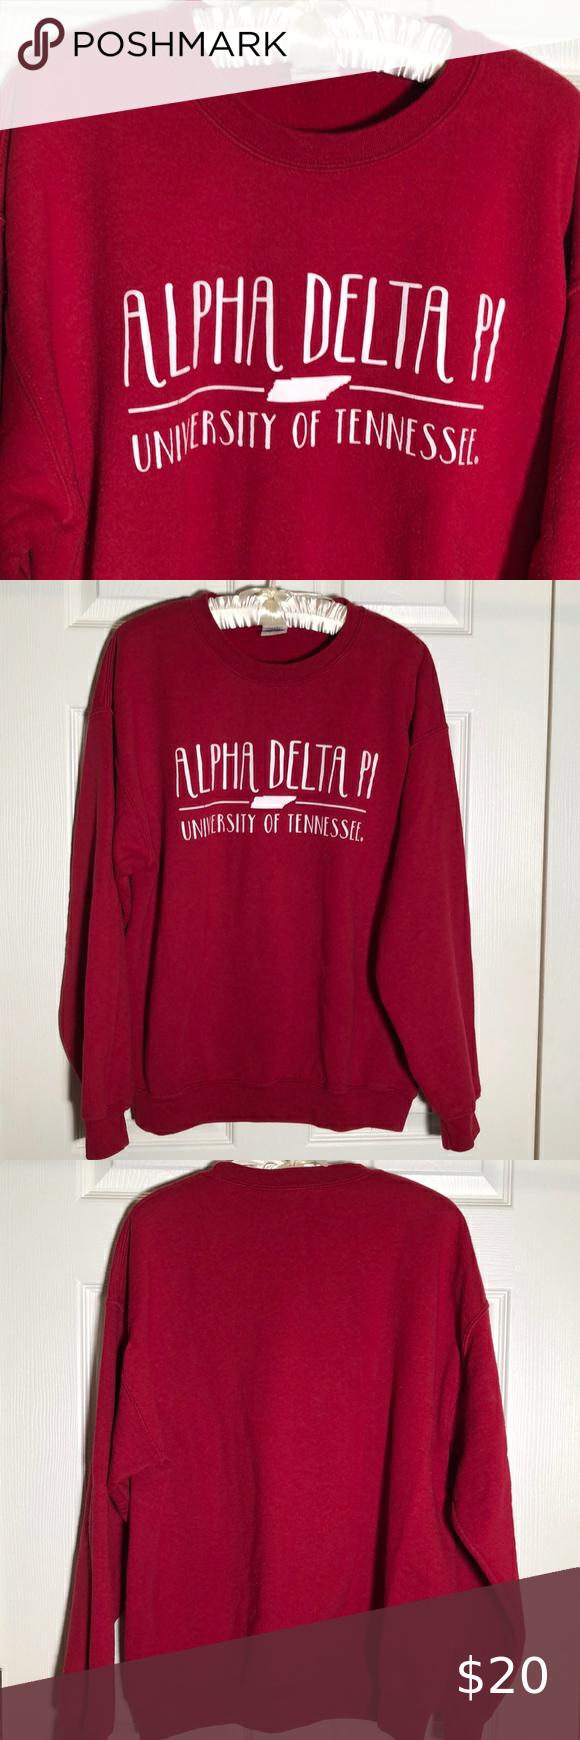 Gilden Alpha Delta Pi Sweatshirt Red Large E B17 Alpha Delta Pi Sweatshirts Sweatshirts Alpha Delta [ 1740 x 580 Pixel ]